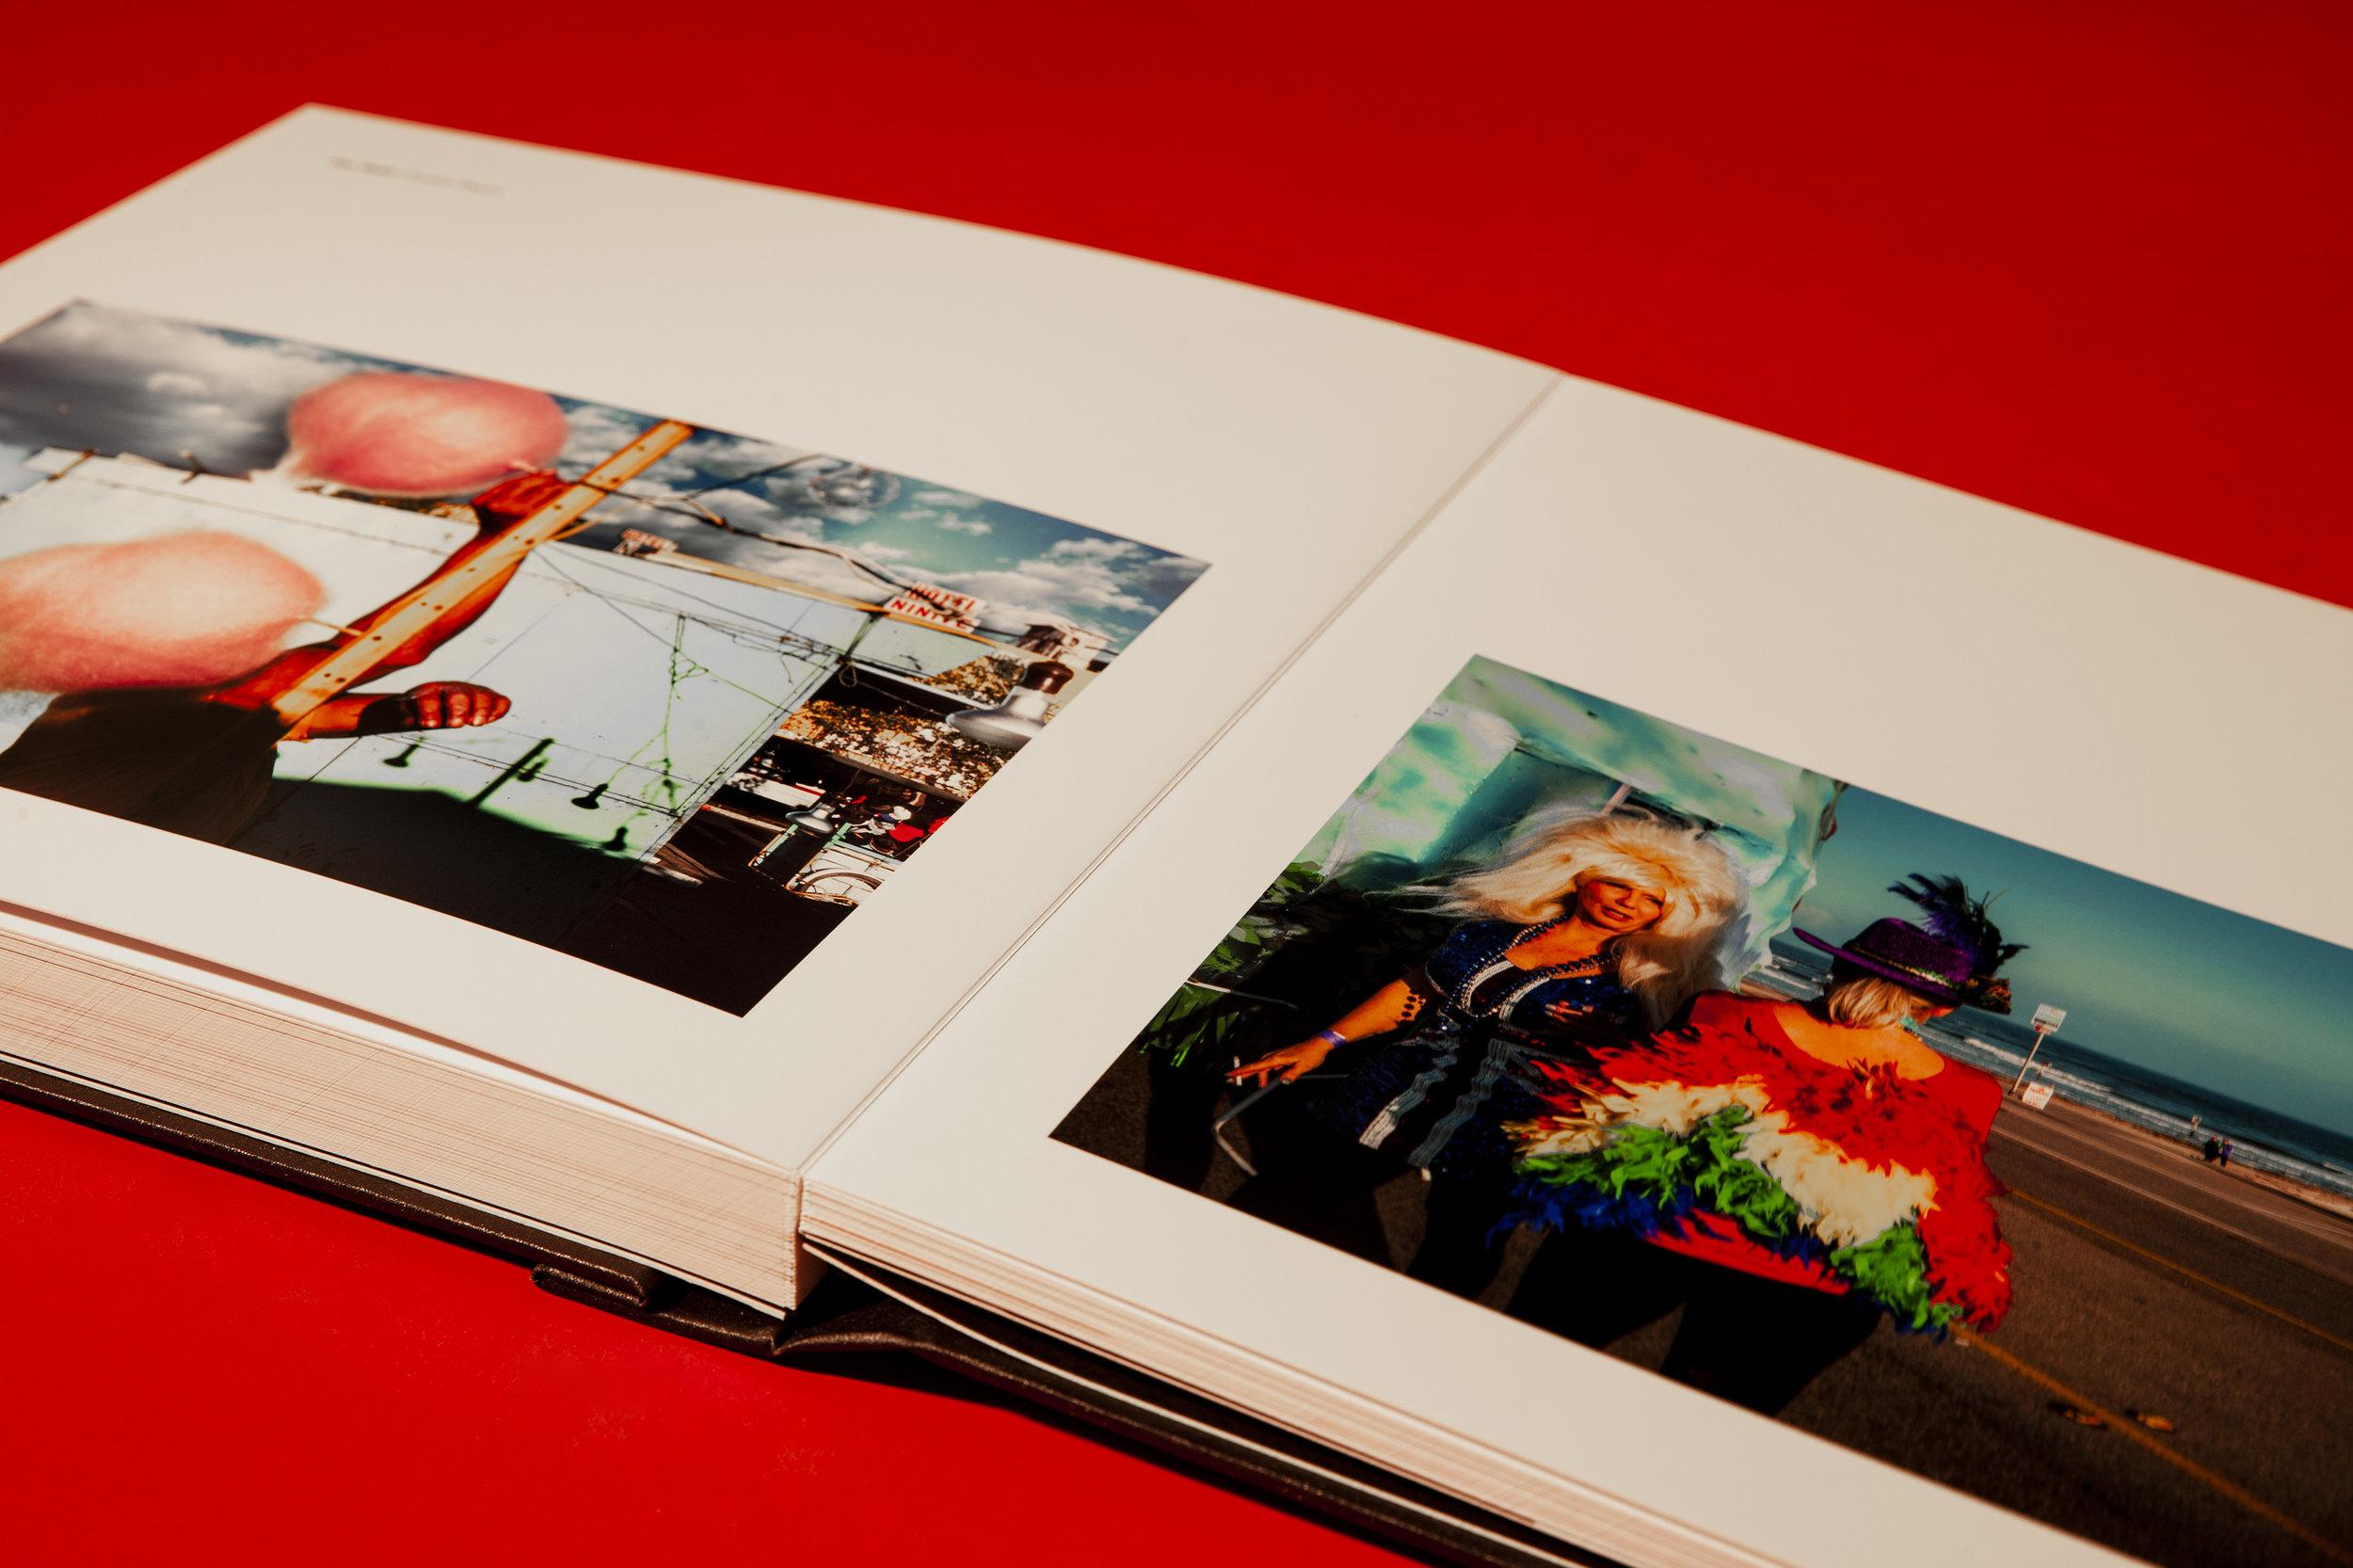 magnum-by-magnum-book12.jpg